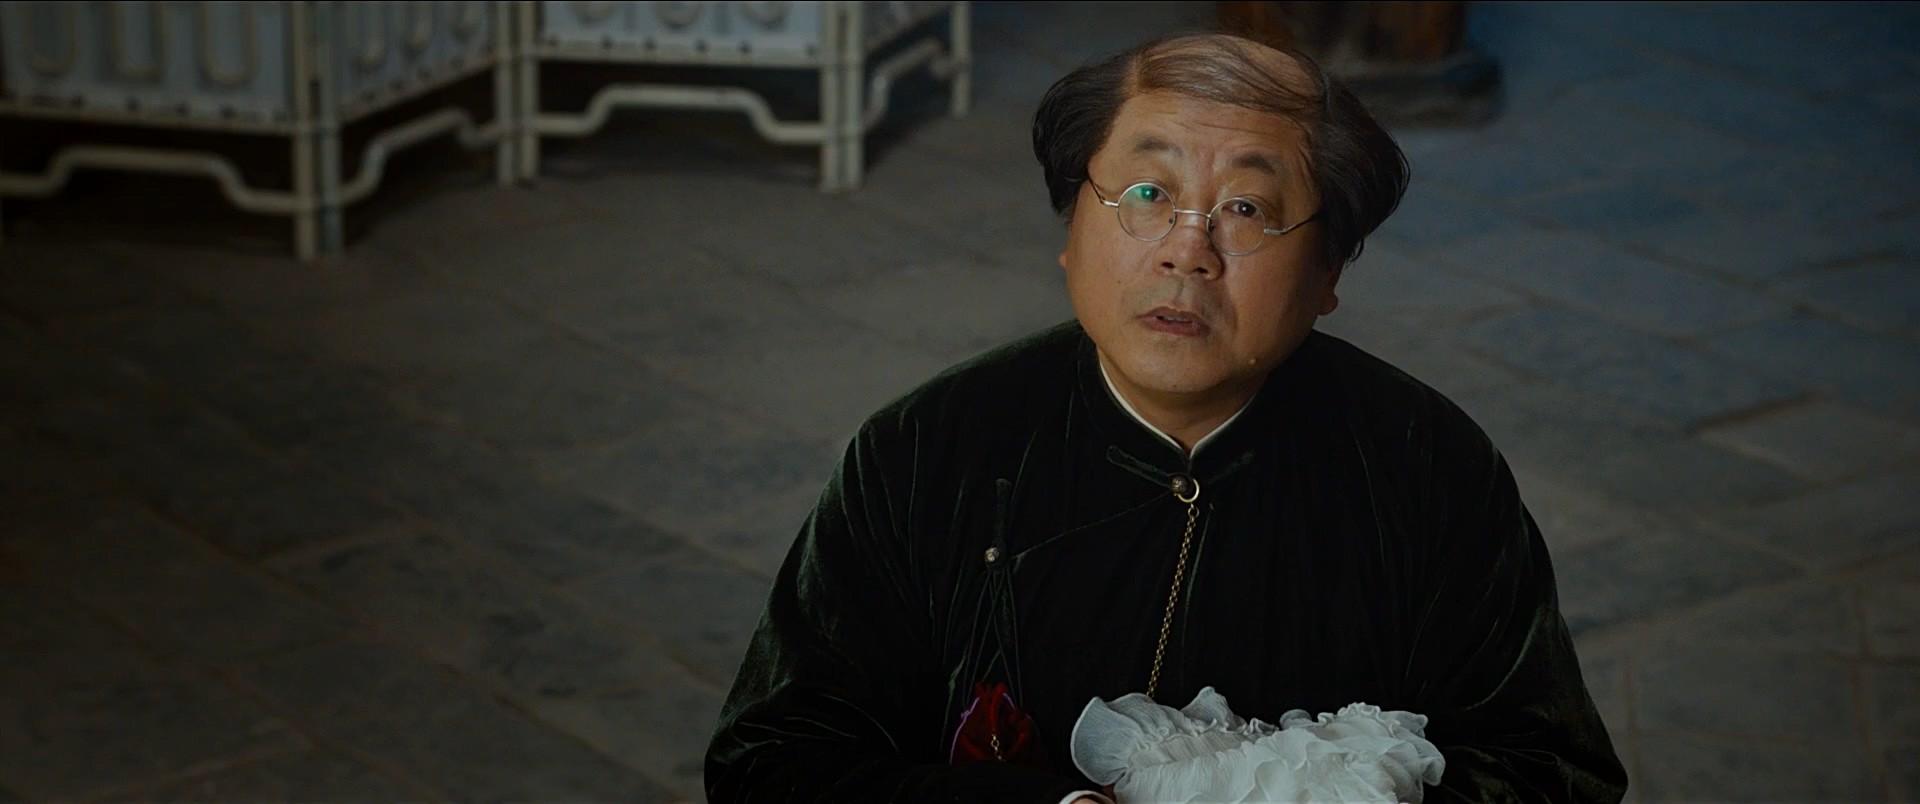 Kung-Fu Keşiş (2015) - film indir